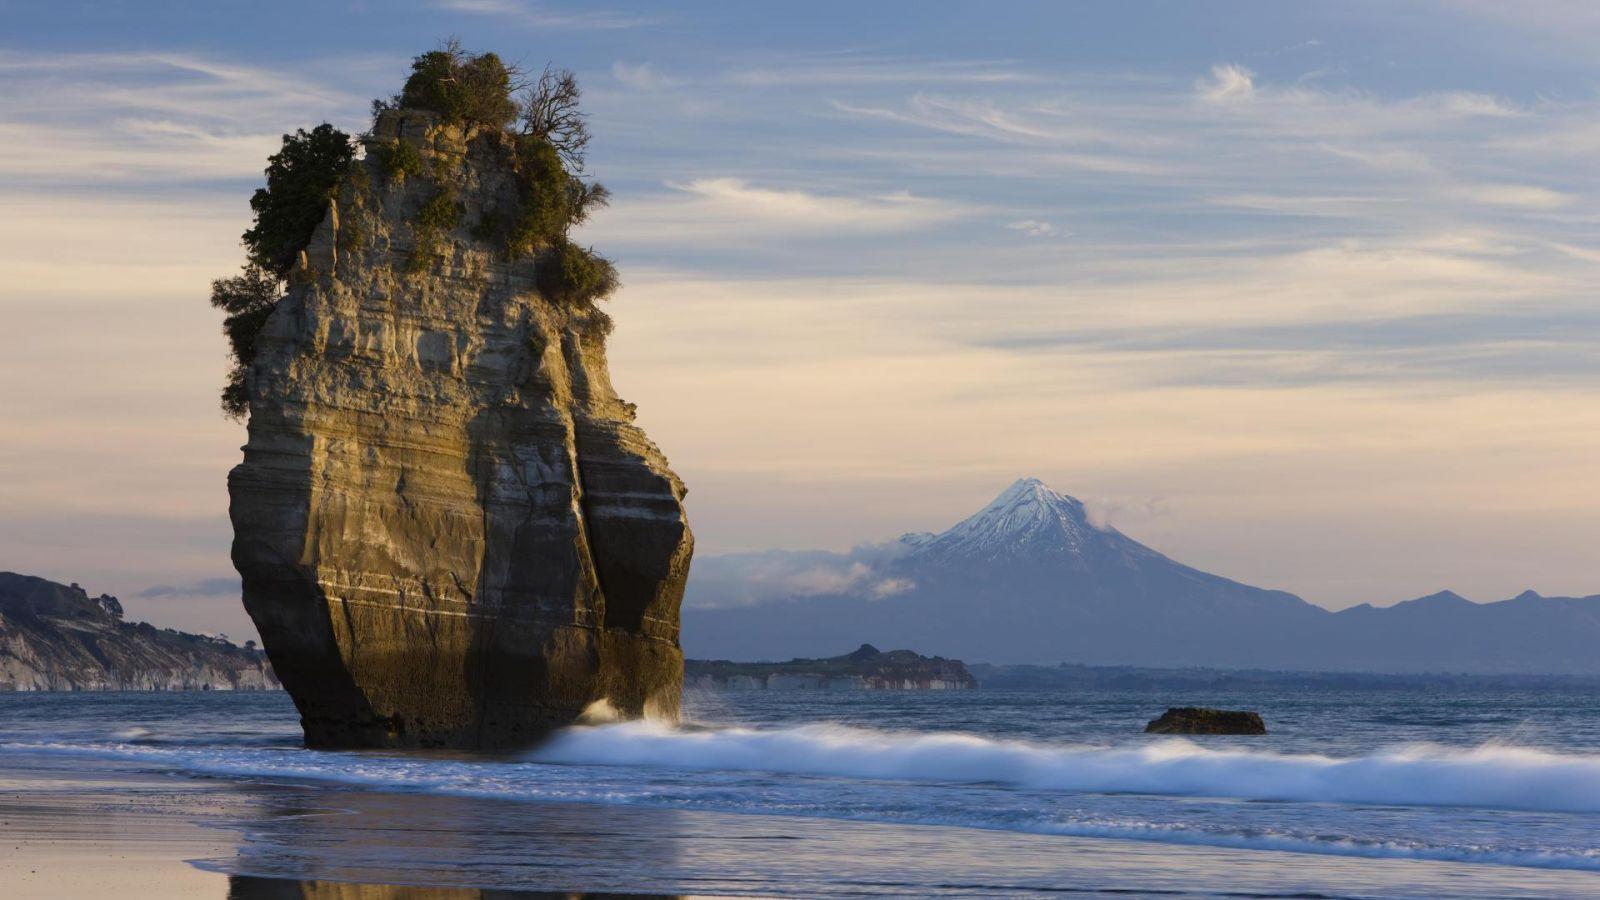 Amazing Rock In Sea